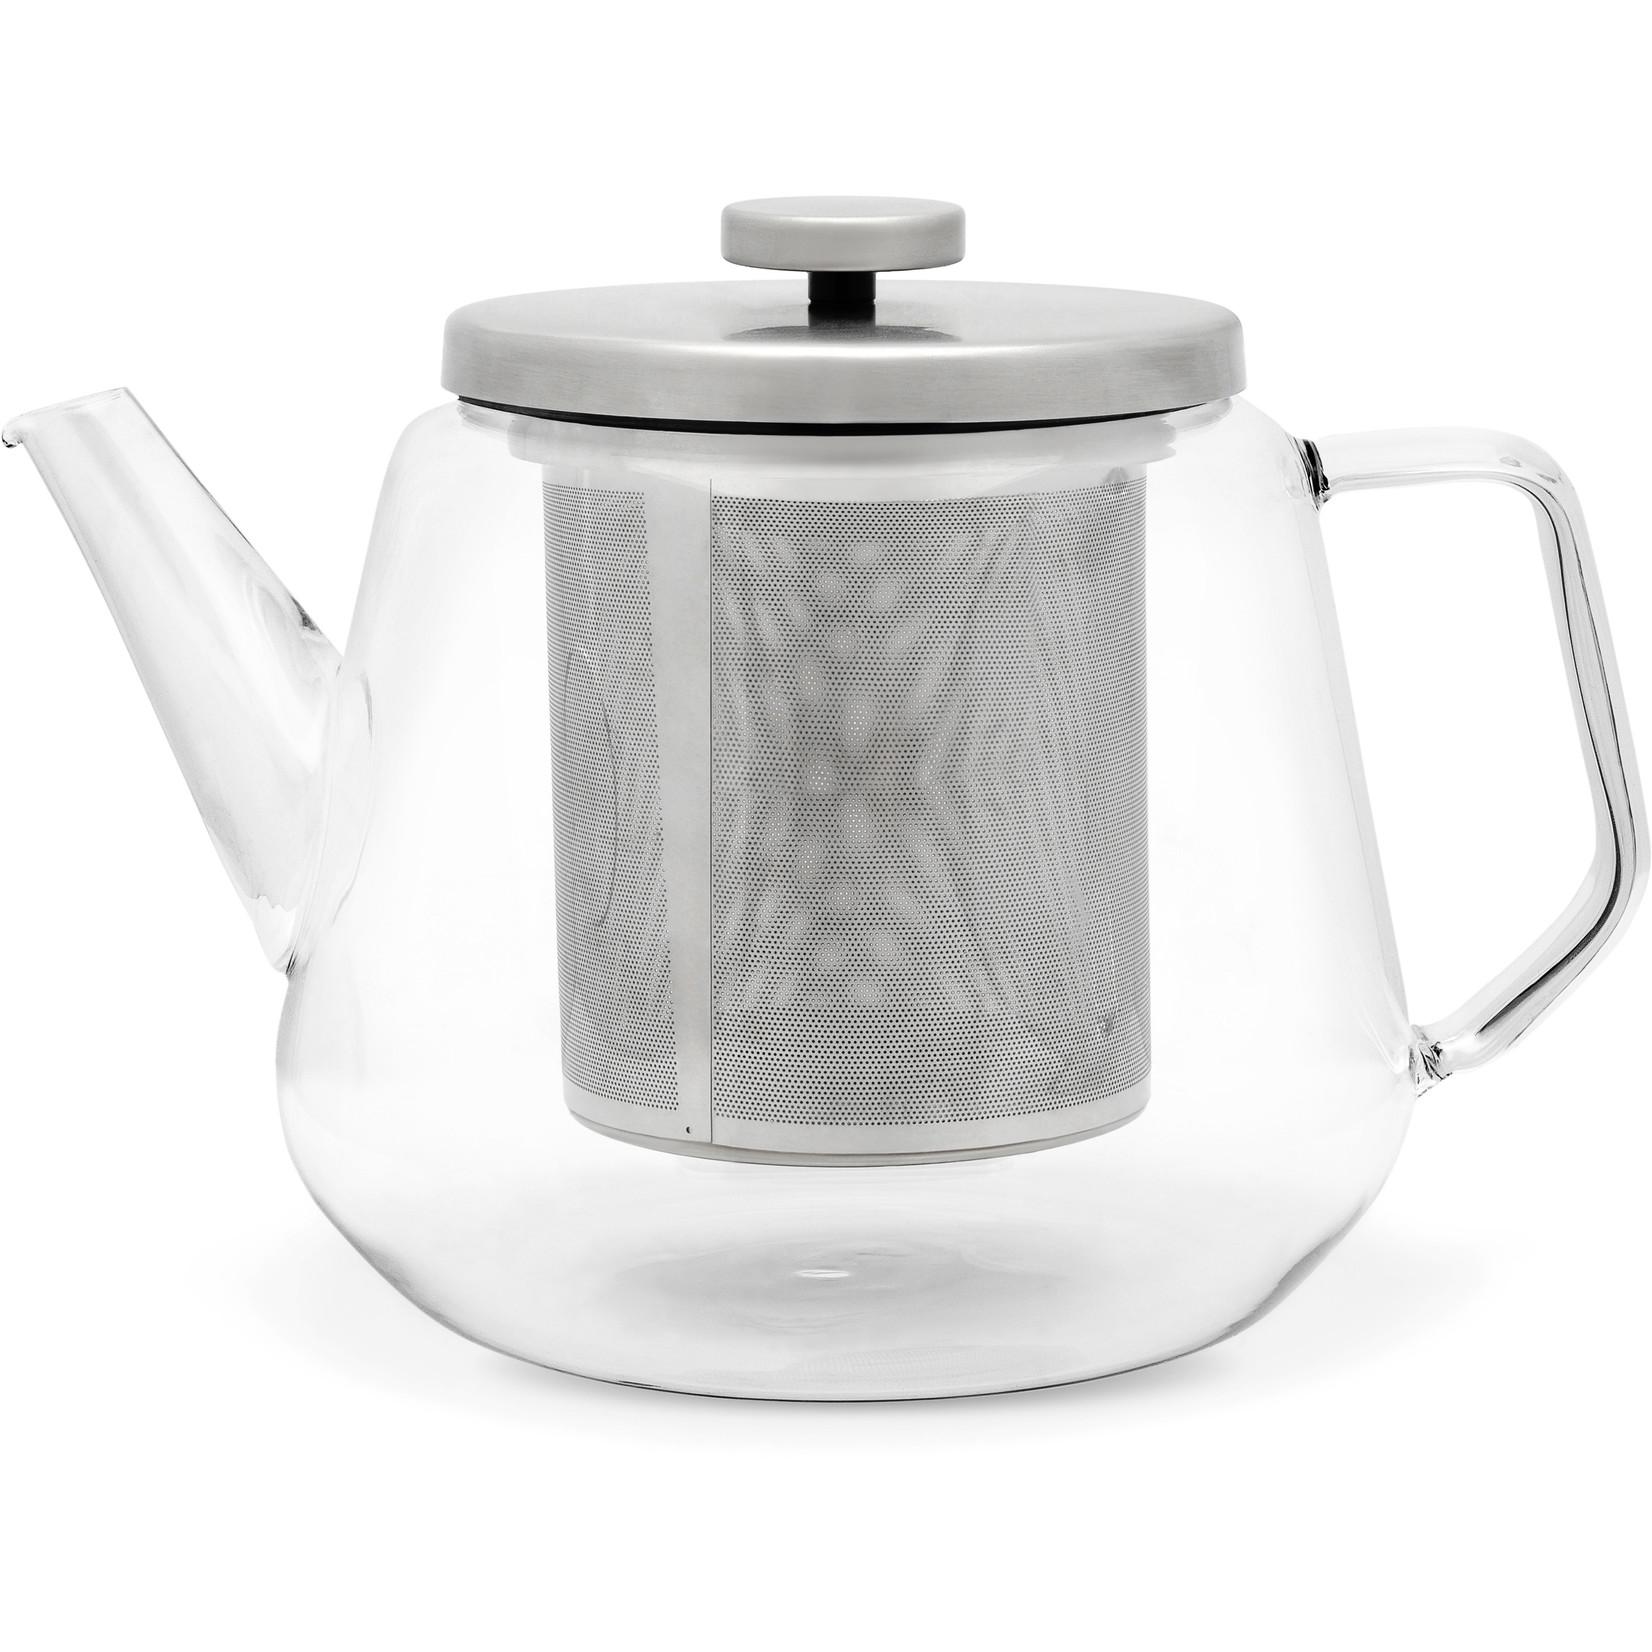 Bredemeijer Bredemeijer Solo Bari theepot 1,5 liter, glas